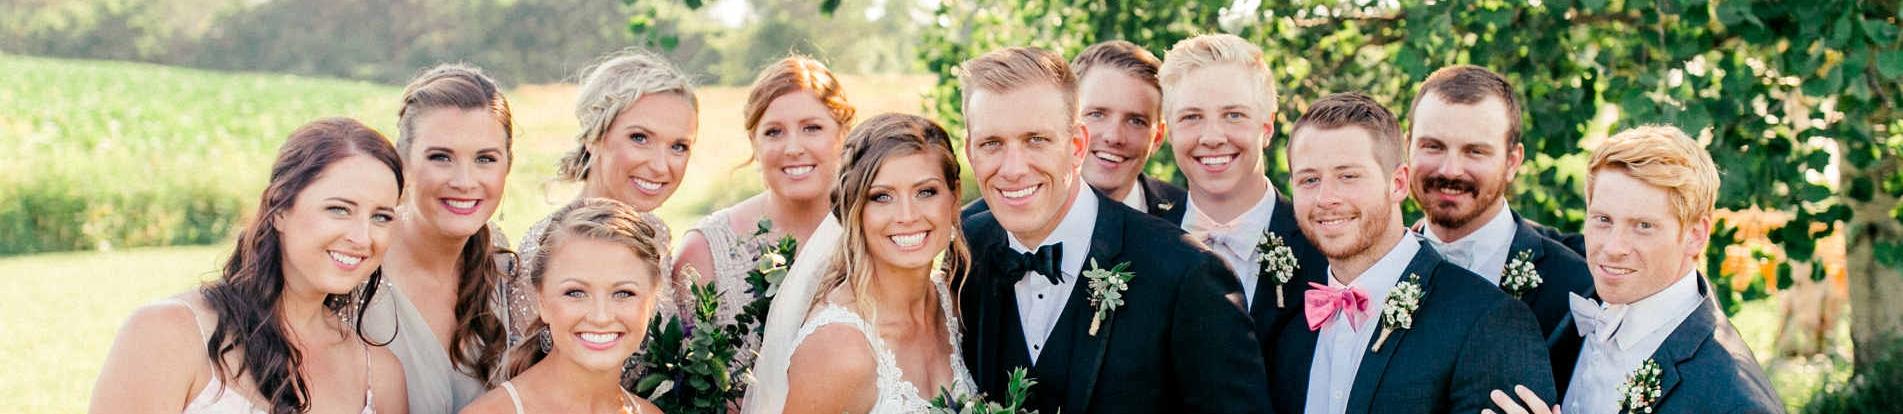 ENZOANI REAL BRIDE: ELISSA & TYLER